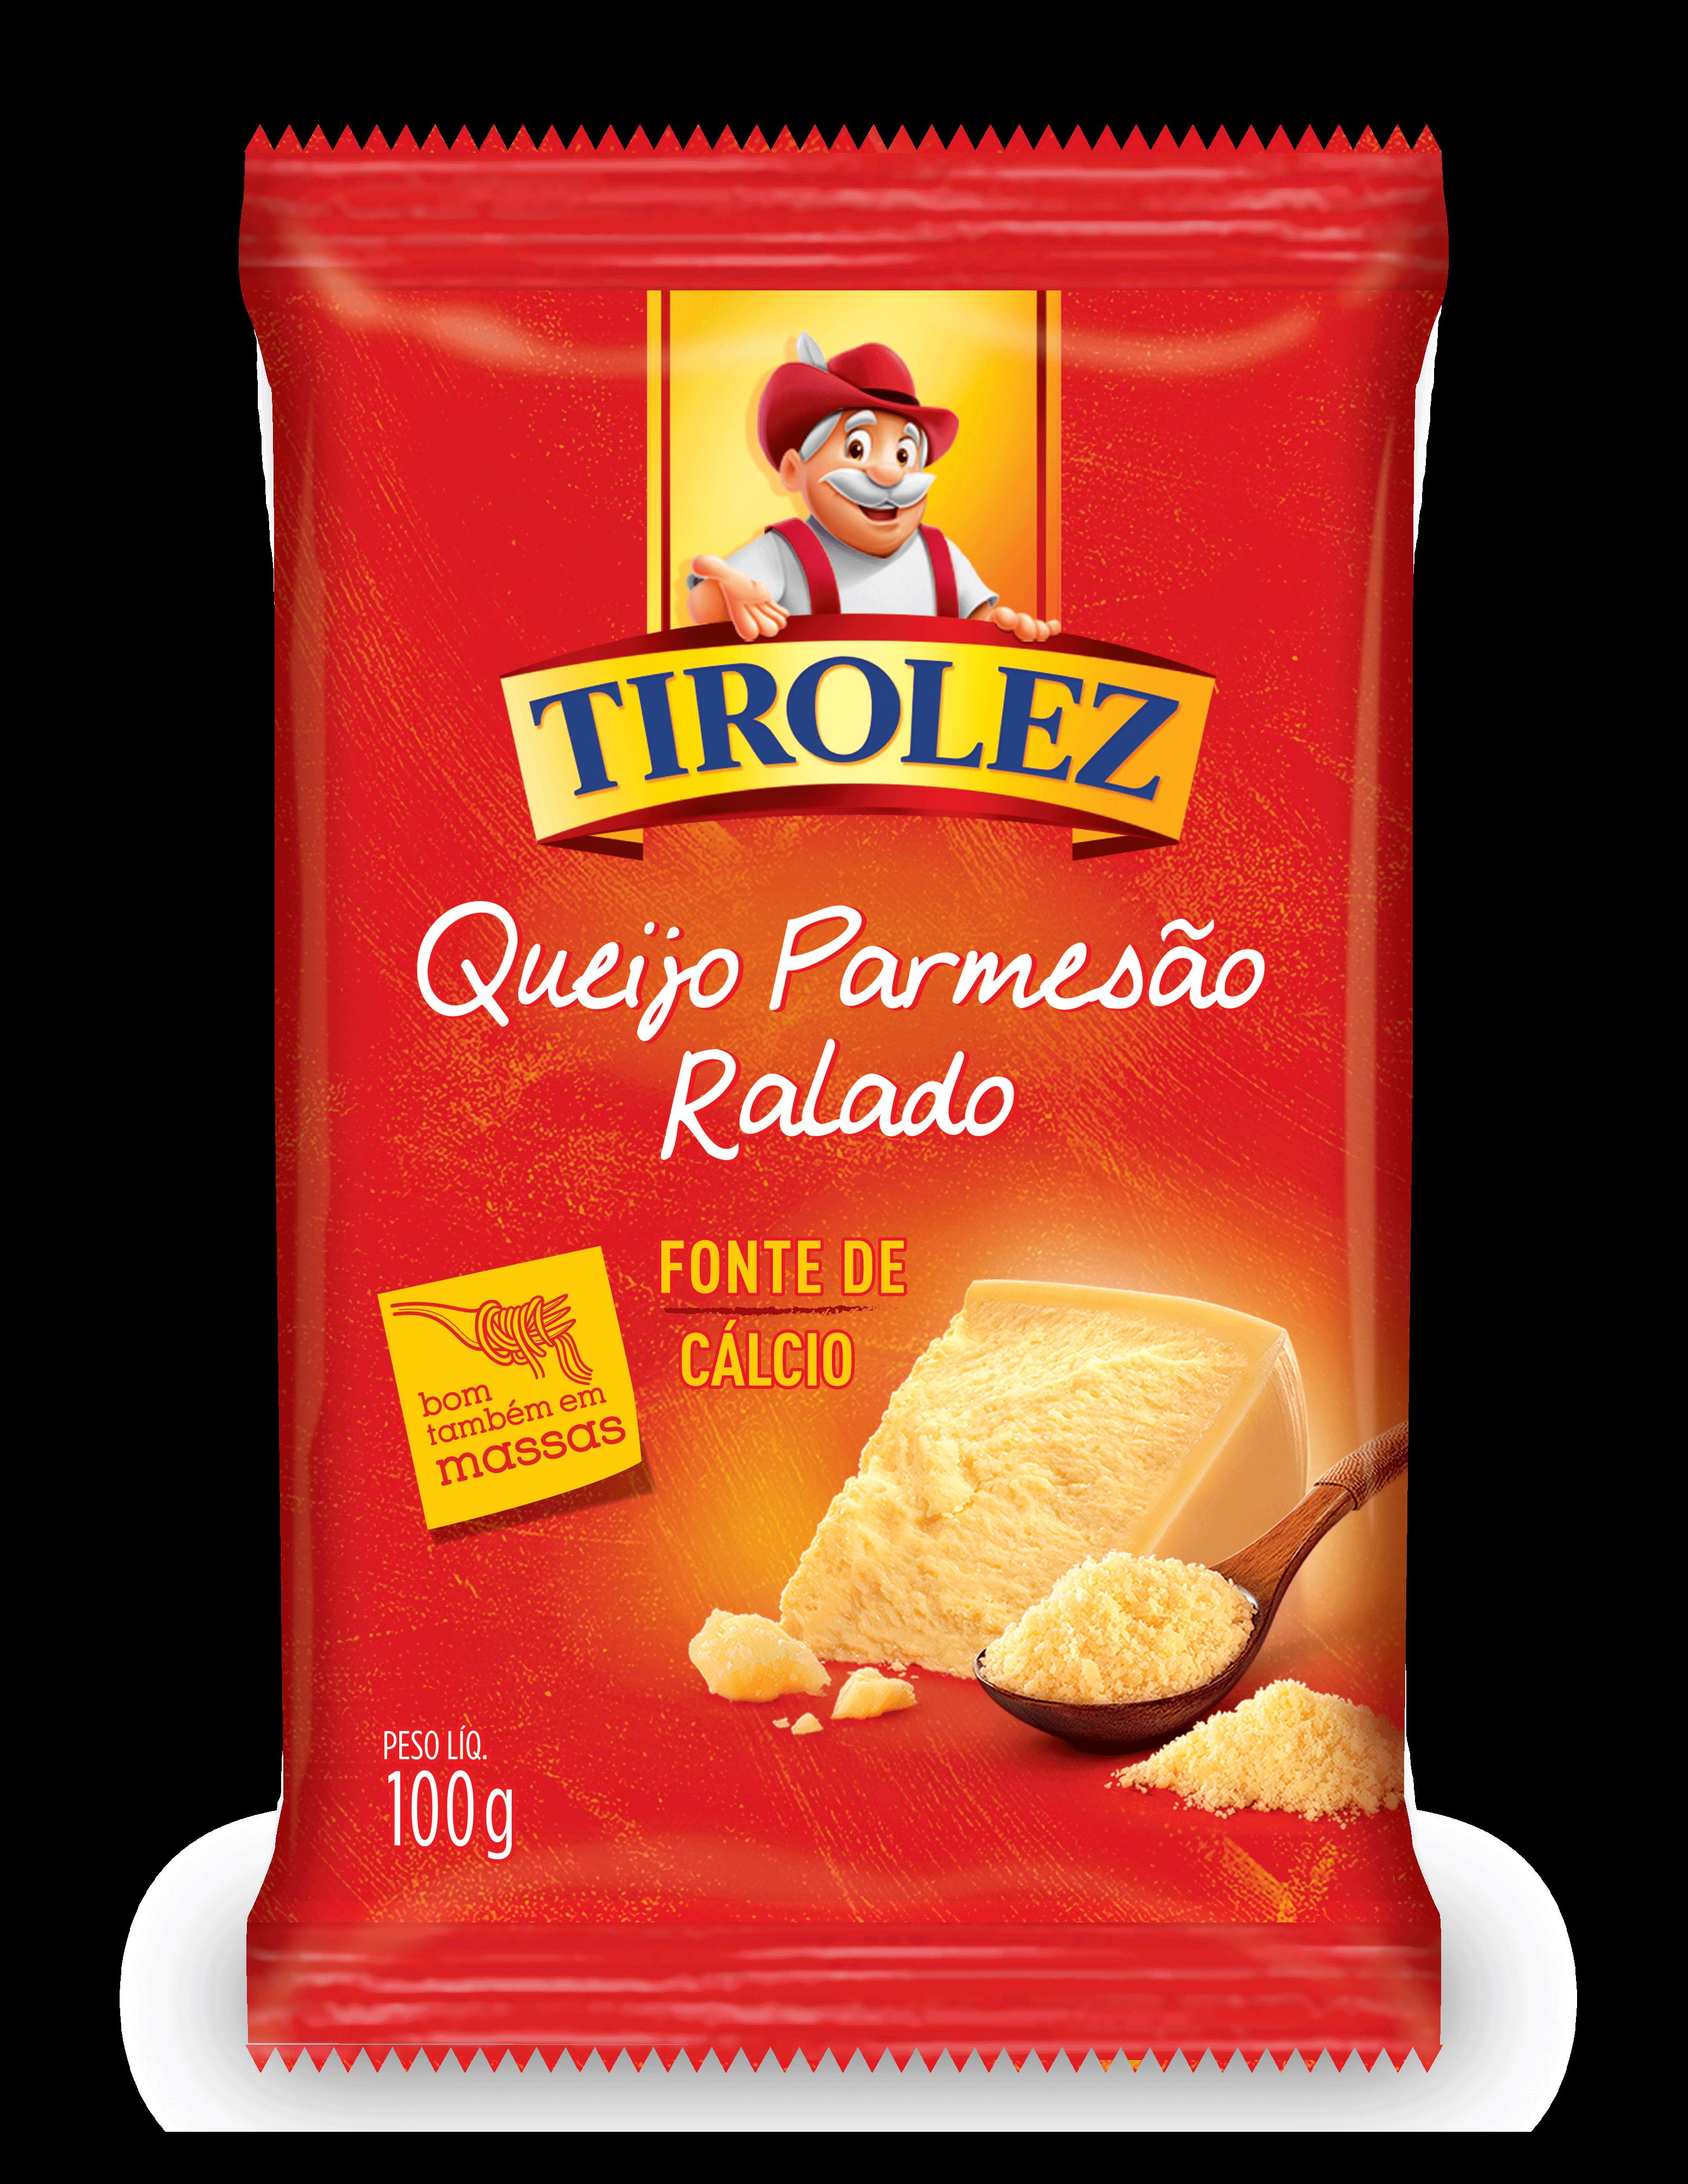 QUEIJO PARMESAO RALADO Tirolez 100g